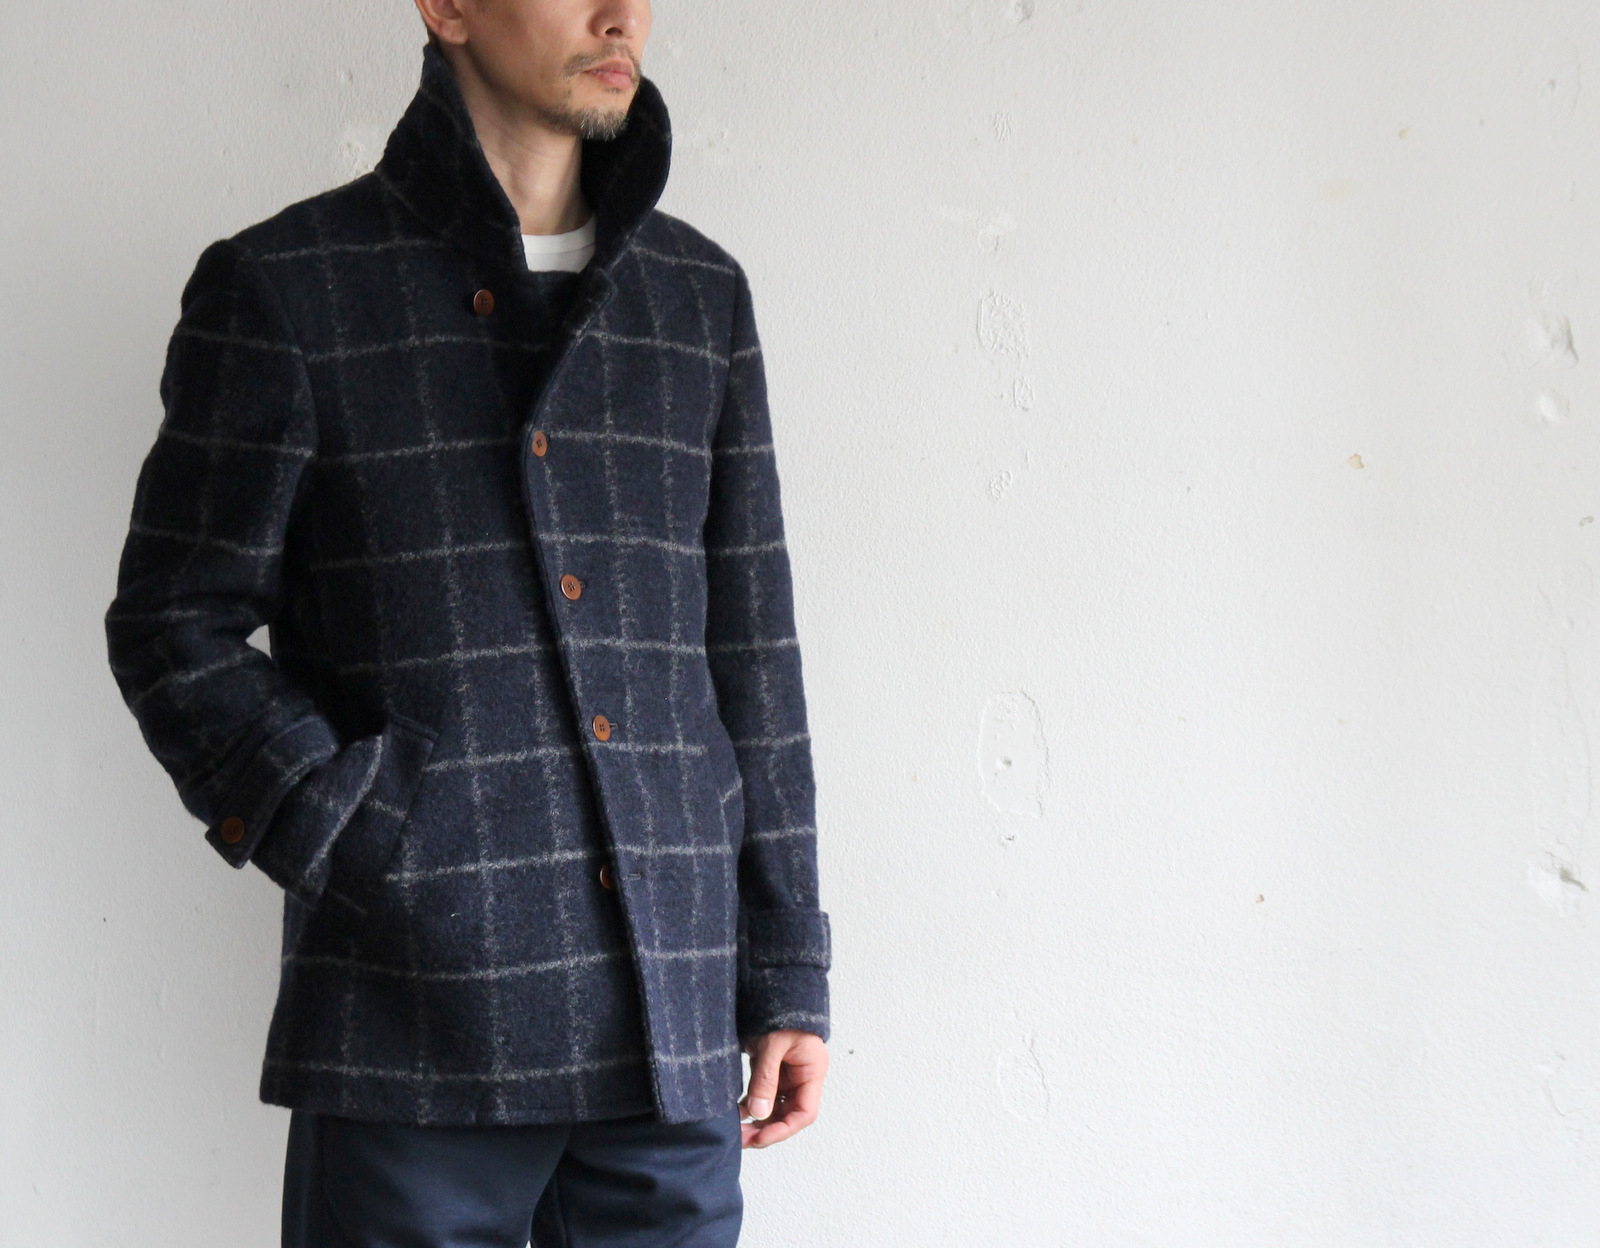 Milling Wool Knit P-coat_c0379477_18313818.jpg